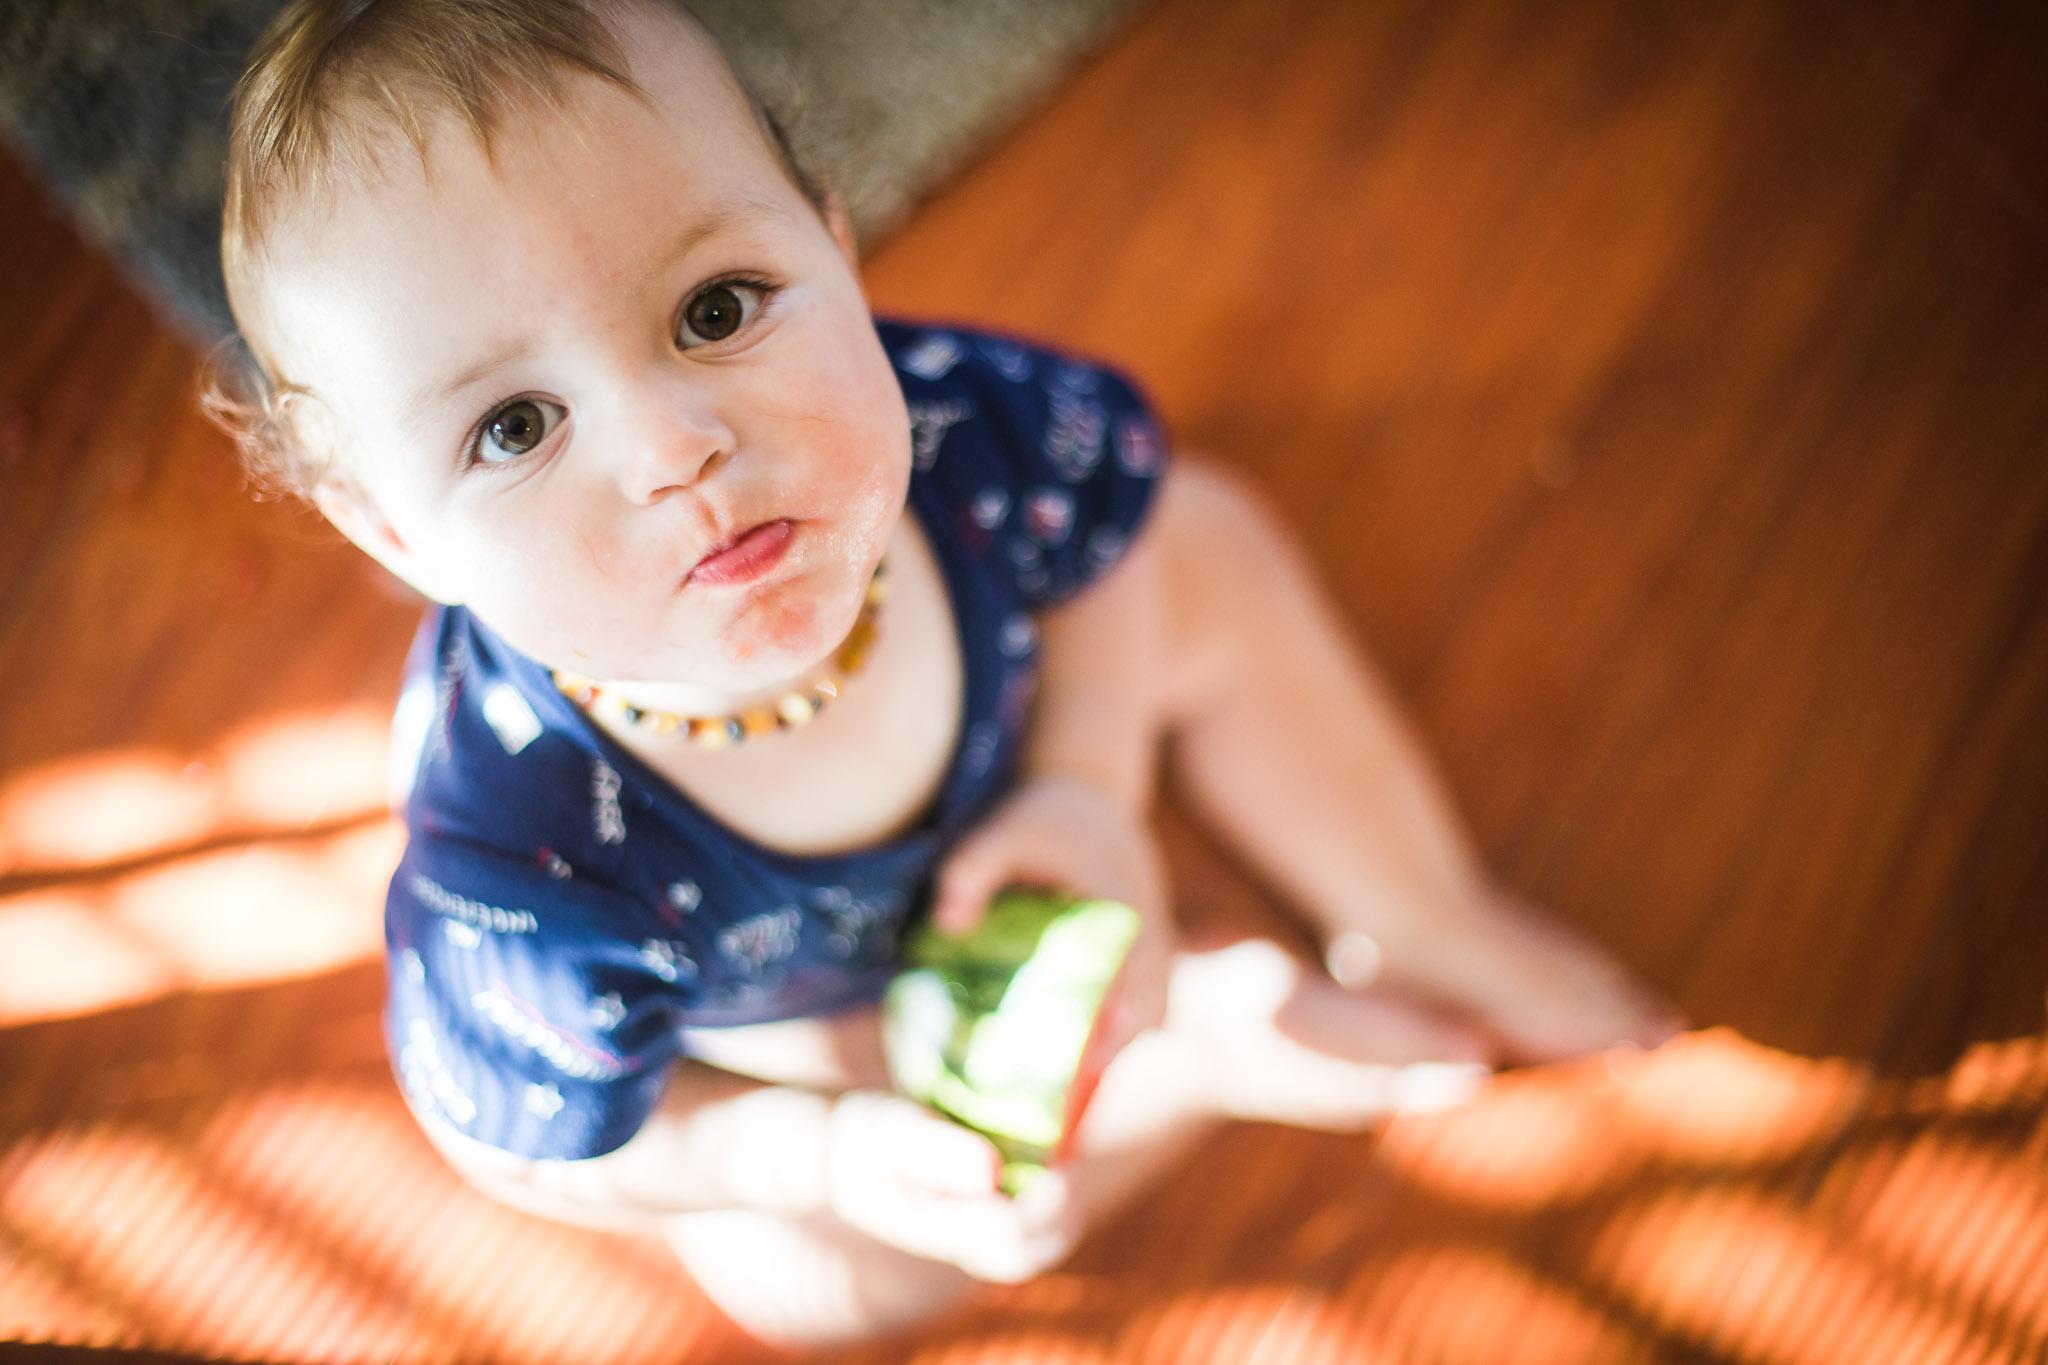 Archer_Inspired_Photography_Watermelon_Baby_Boy_Eating_Lifestyle_Photographer_California-38.jpg